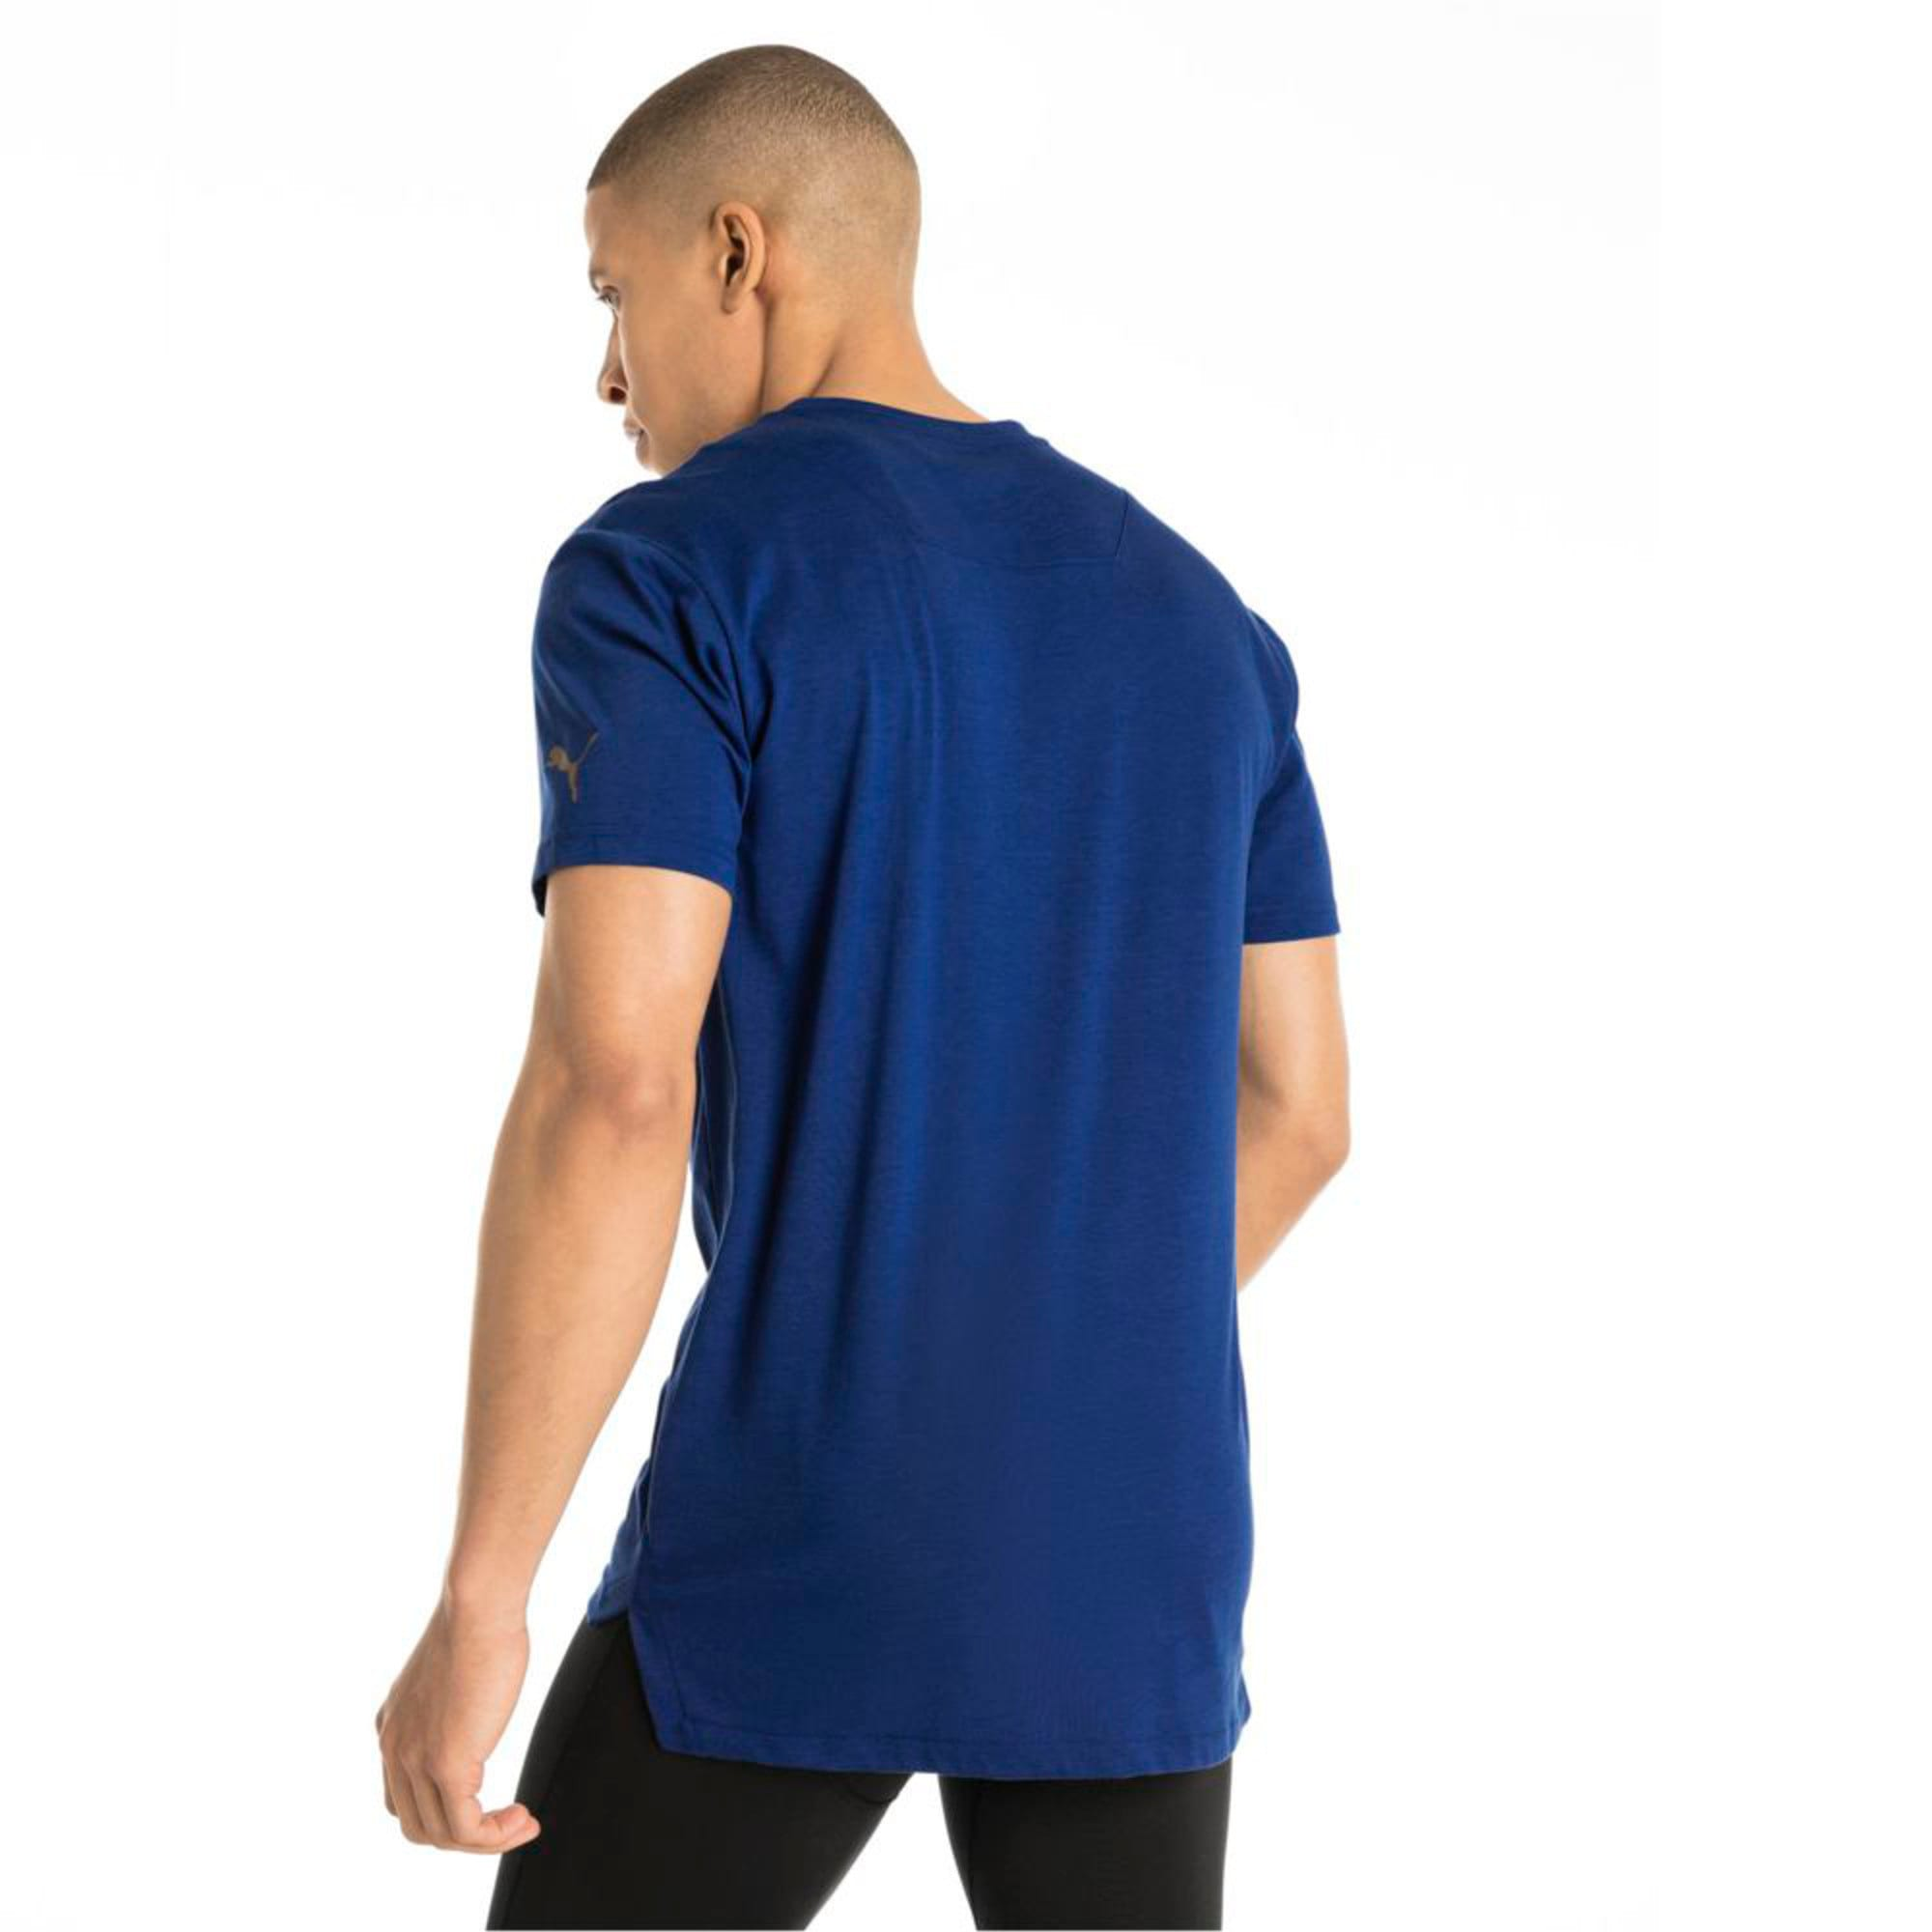 Thumbnail 1 of Energy Triblend Graphic Men's Running Tee, Sodalite Blue, medium-IND